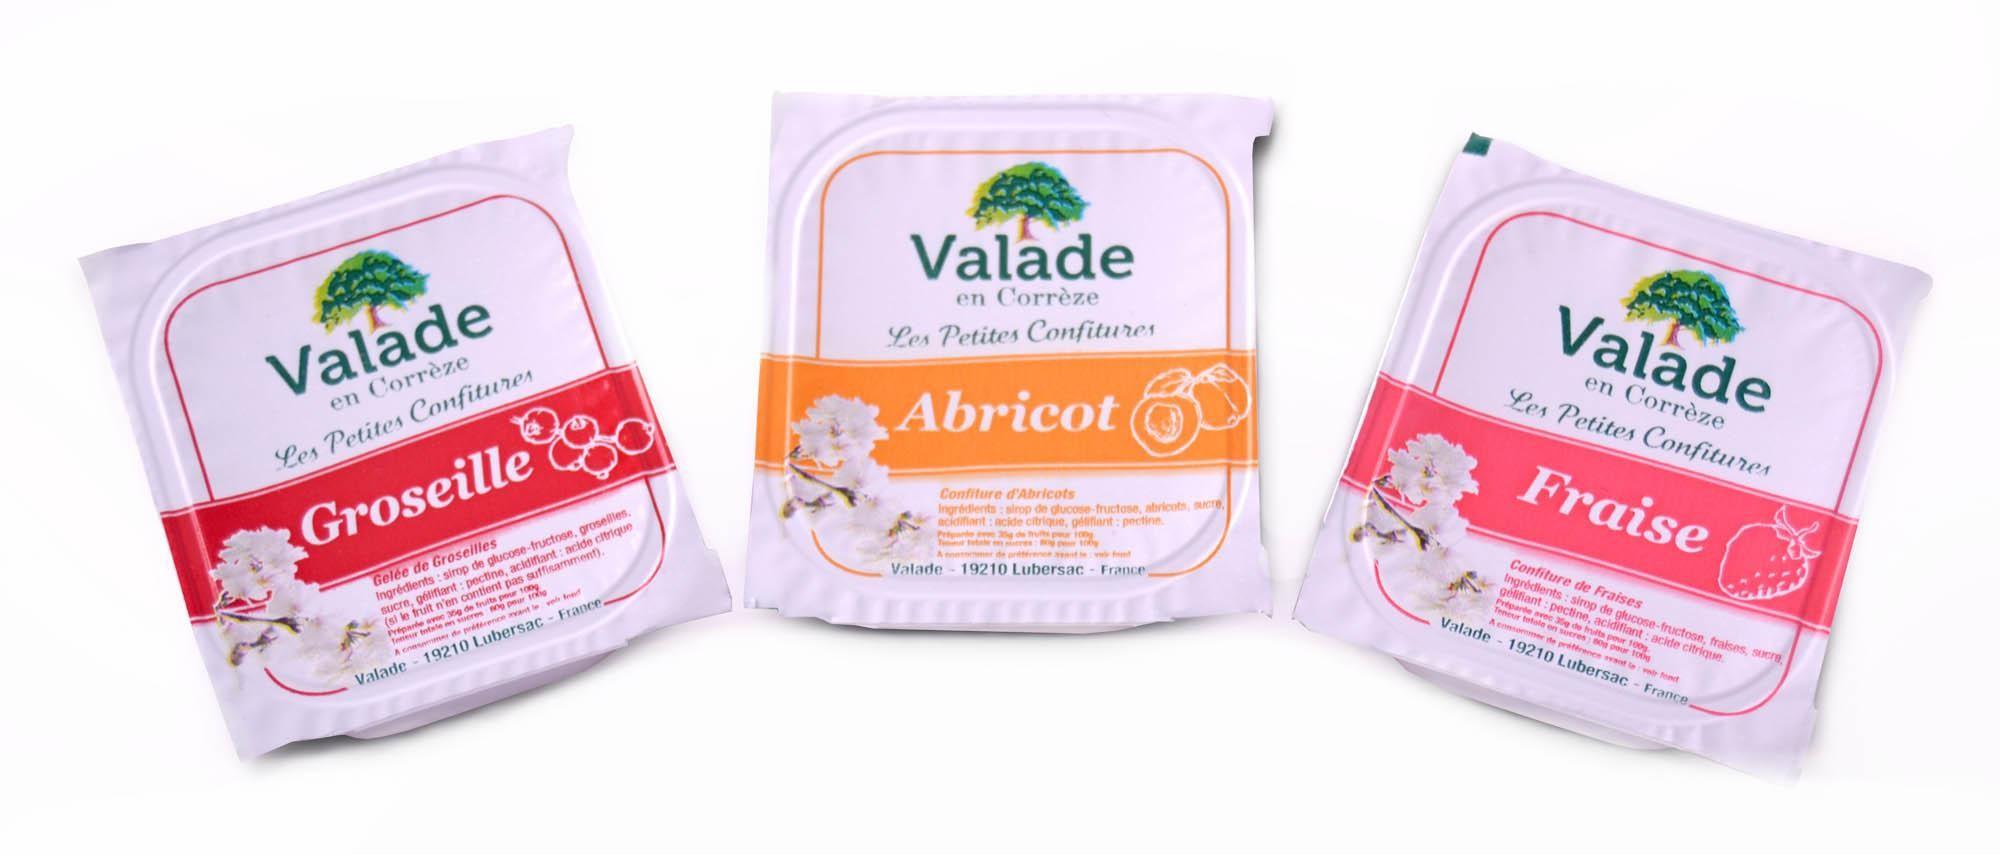 Valade portions individuelles confiture assortiment 180x20gr 35% fruits